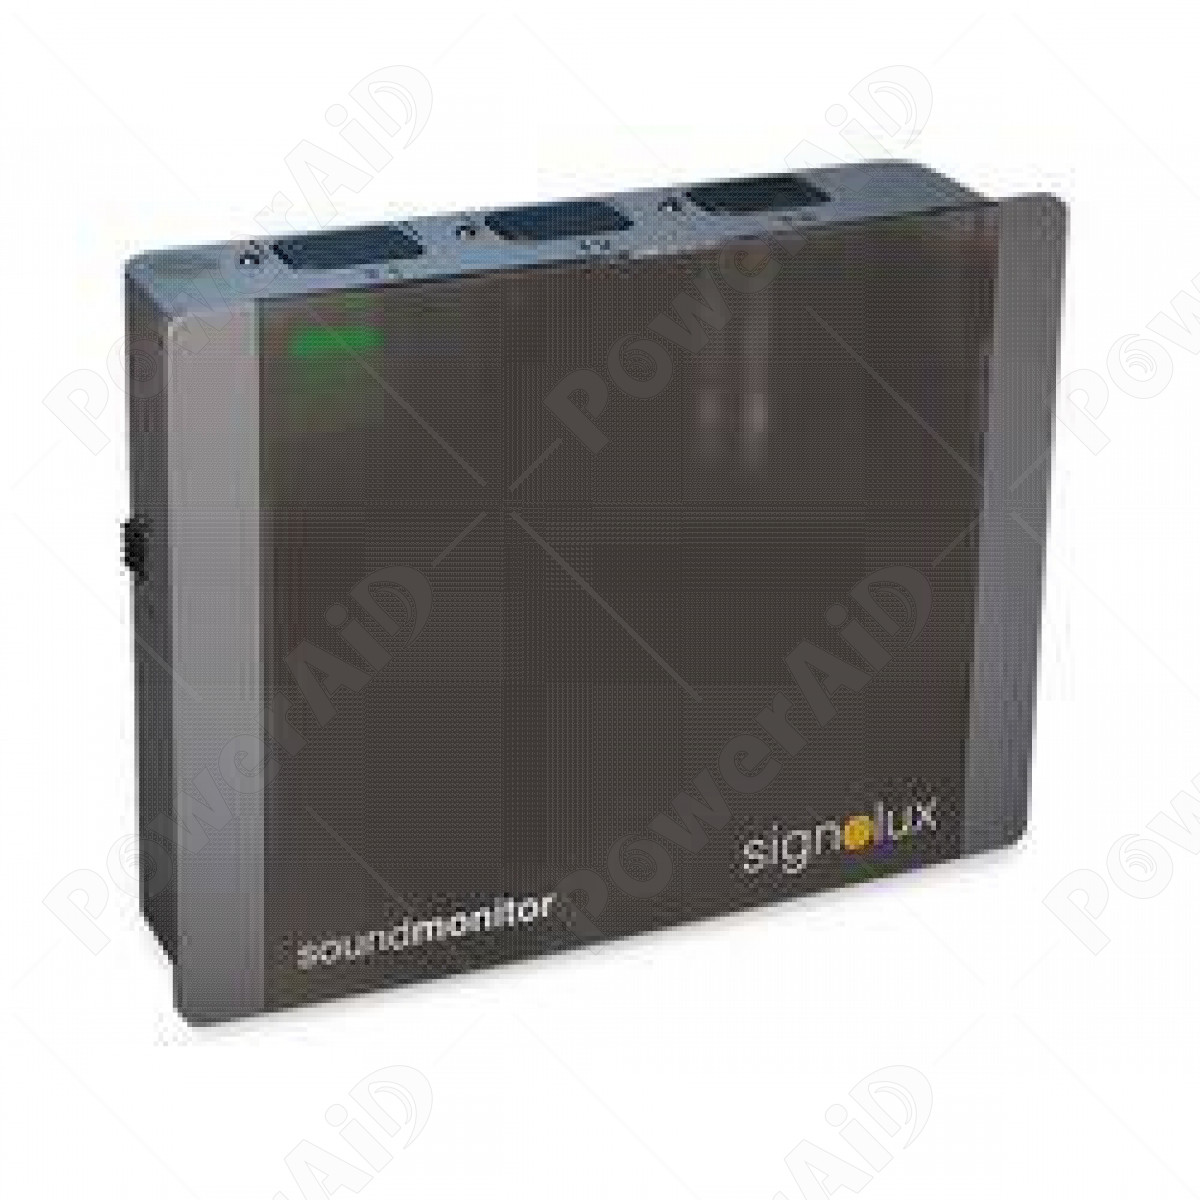 Humantechnik - Sound Monitor Trasmettitore Signolux